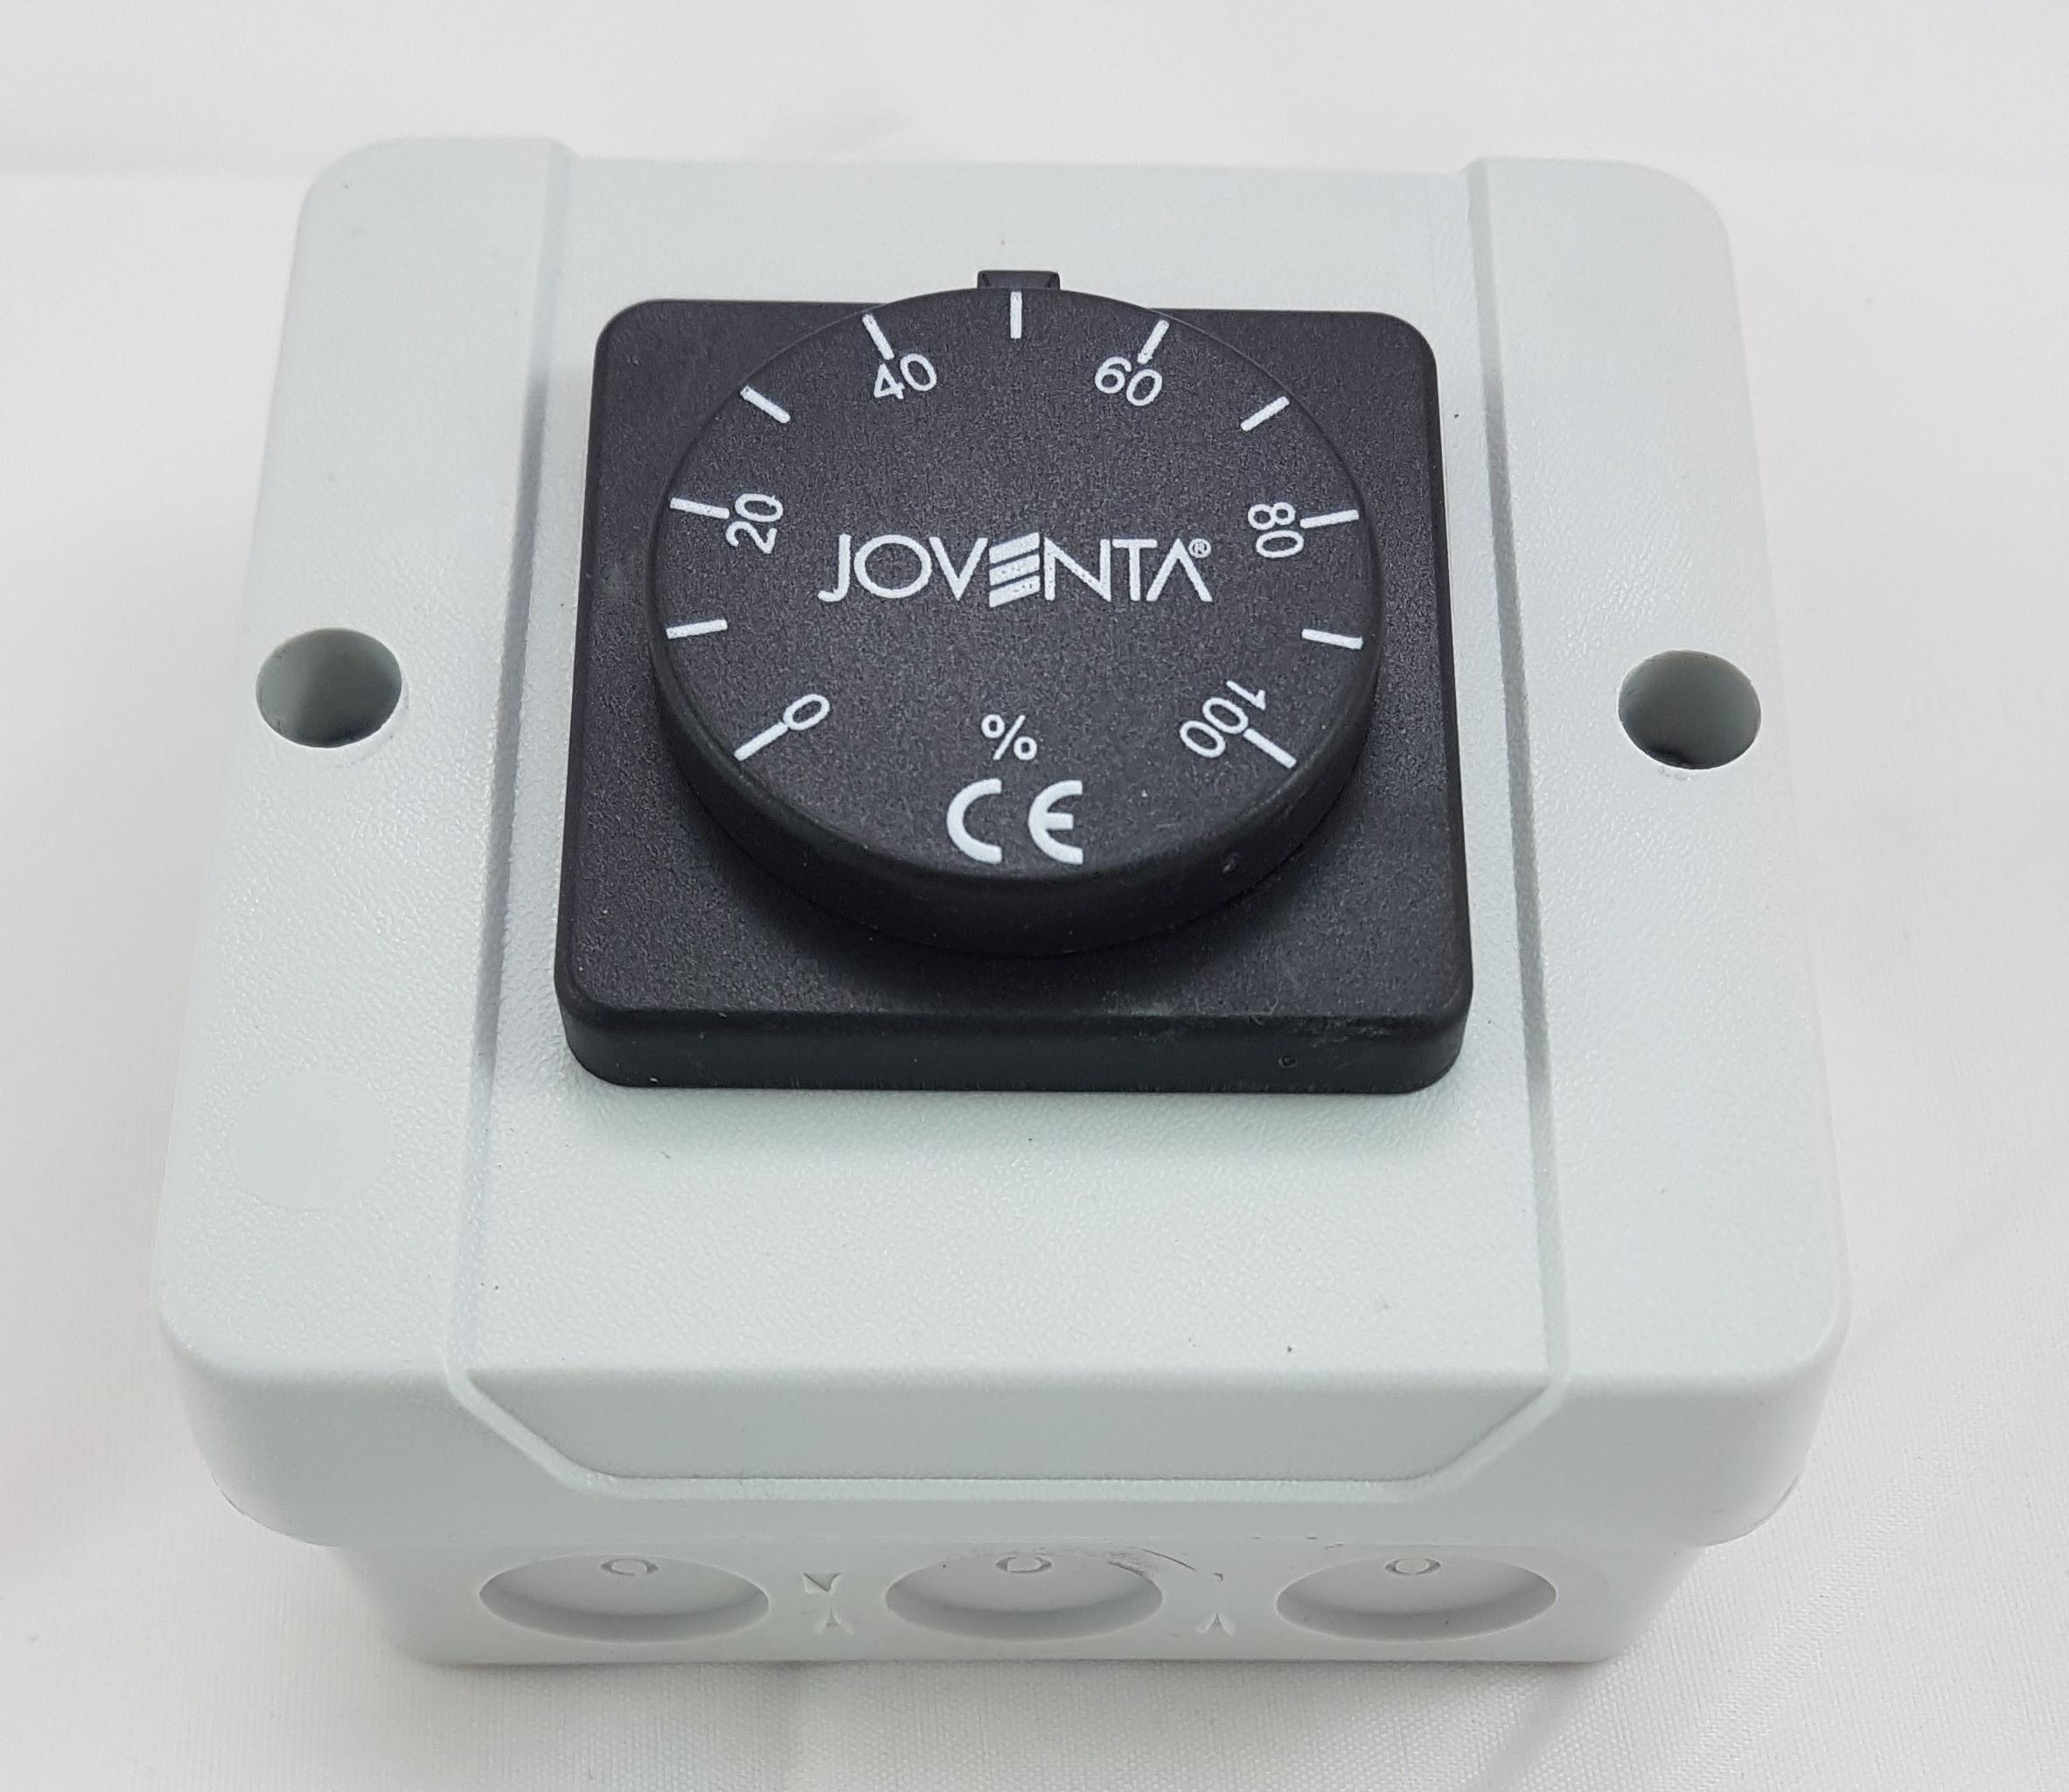 Joventa Potentiometer 24V 0-10V Regelung von Absperrklappen Volumenstrom